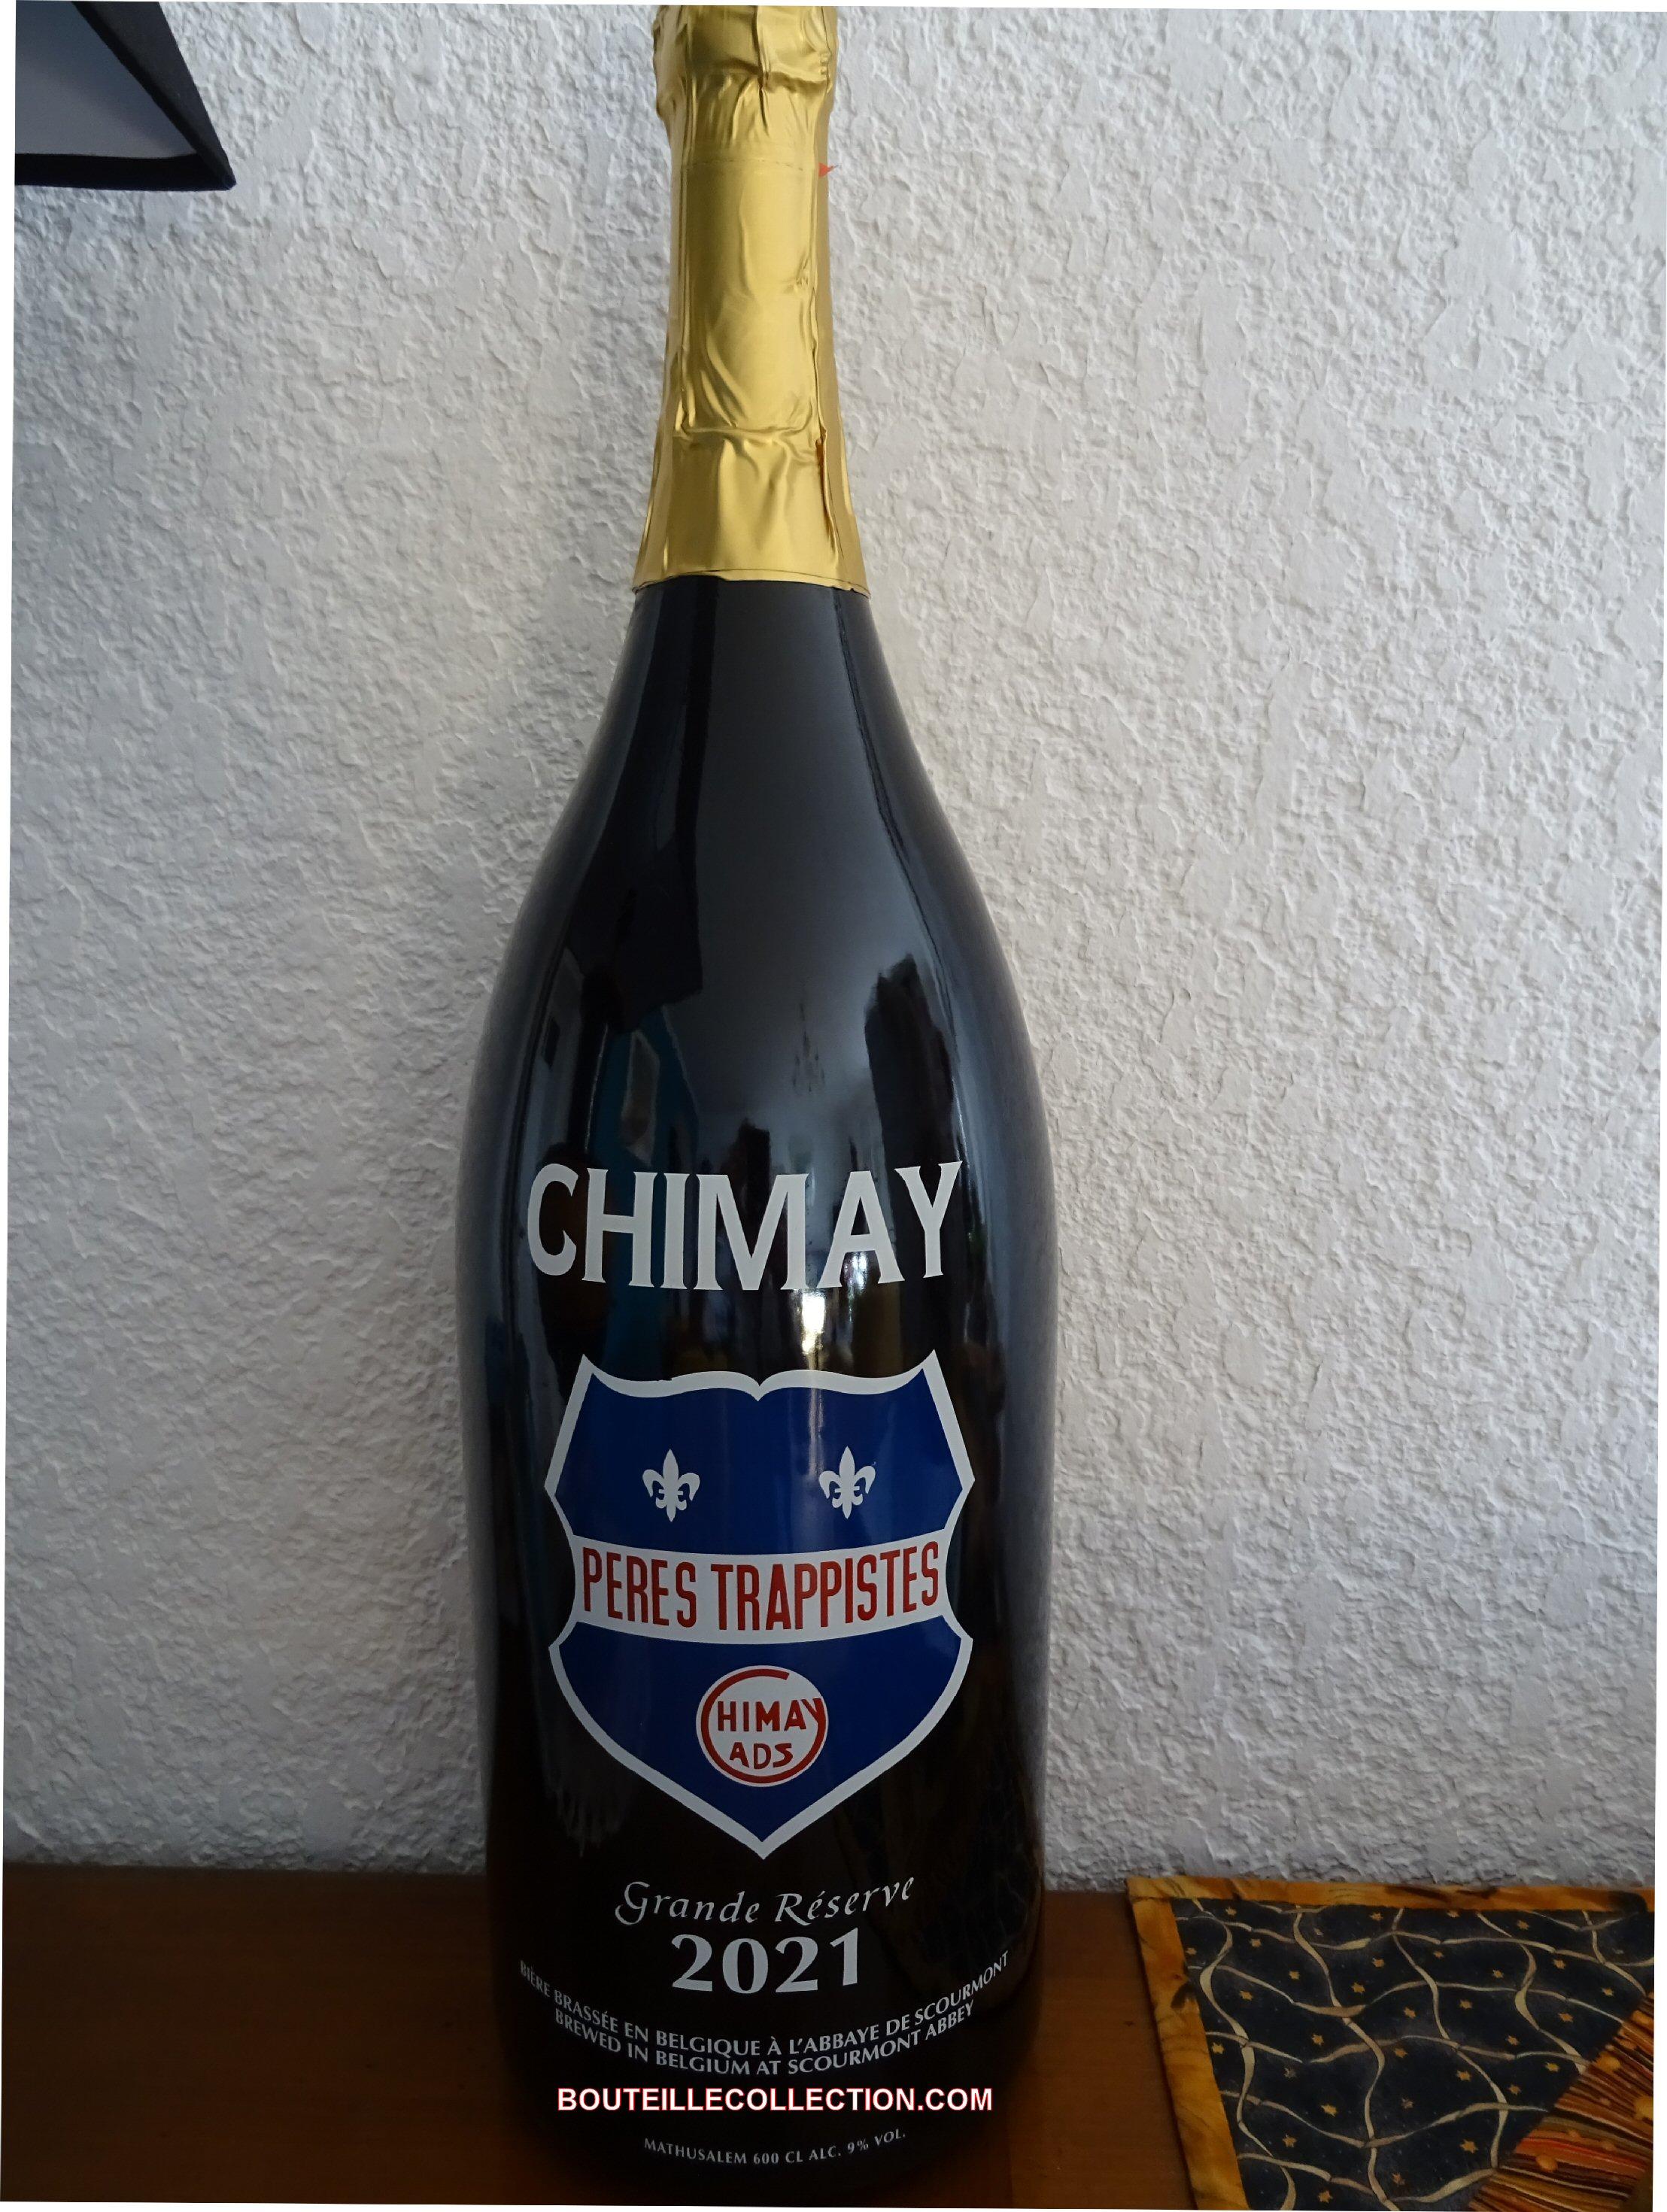 CHIMAY MATHUSALEM 6L 2021 C .JPG